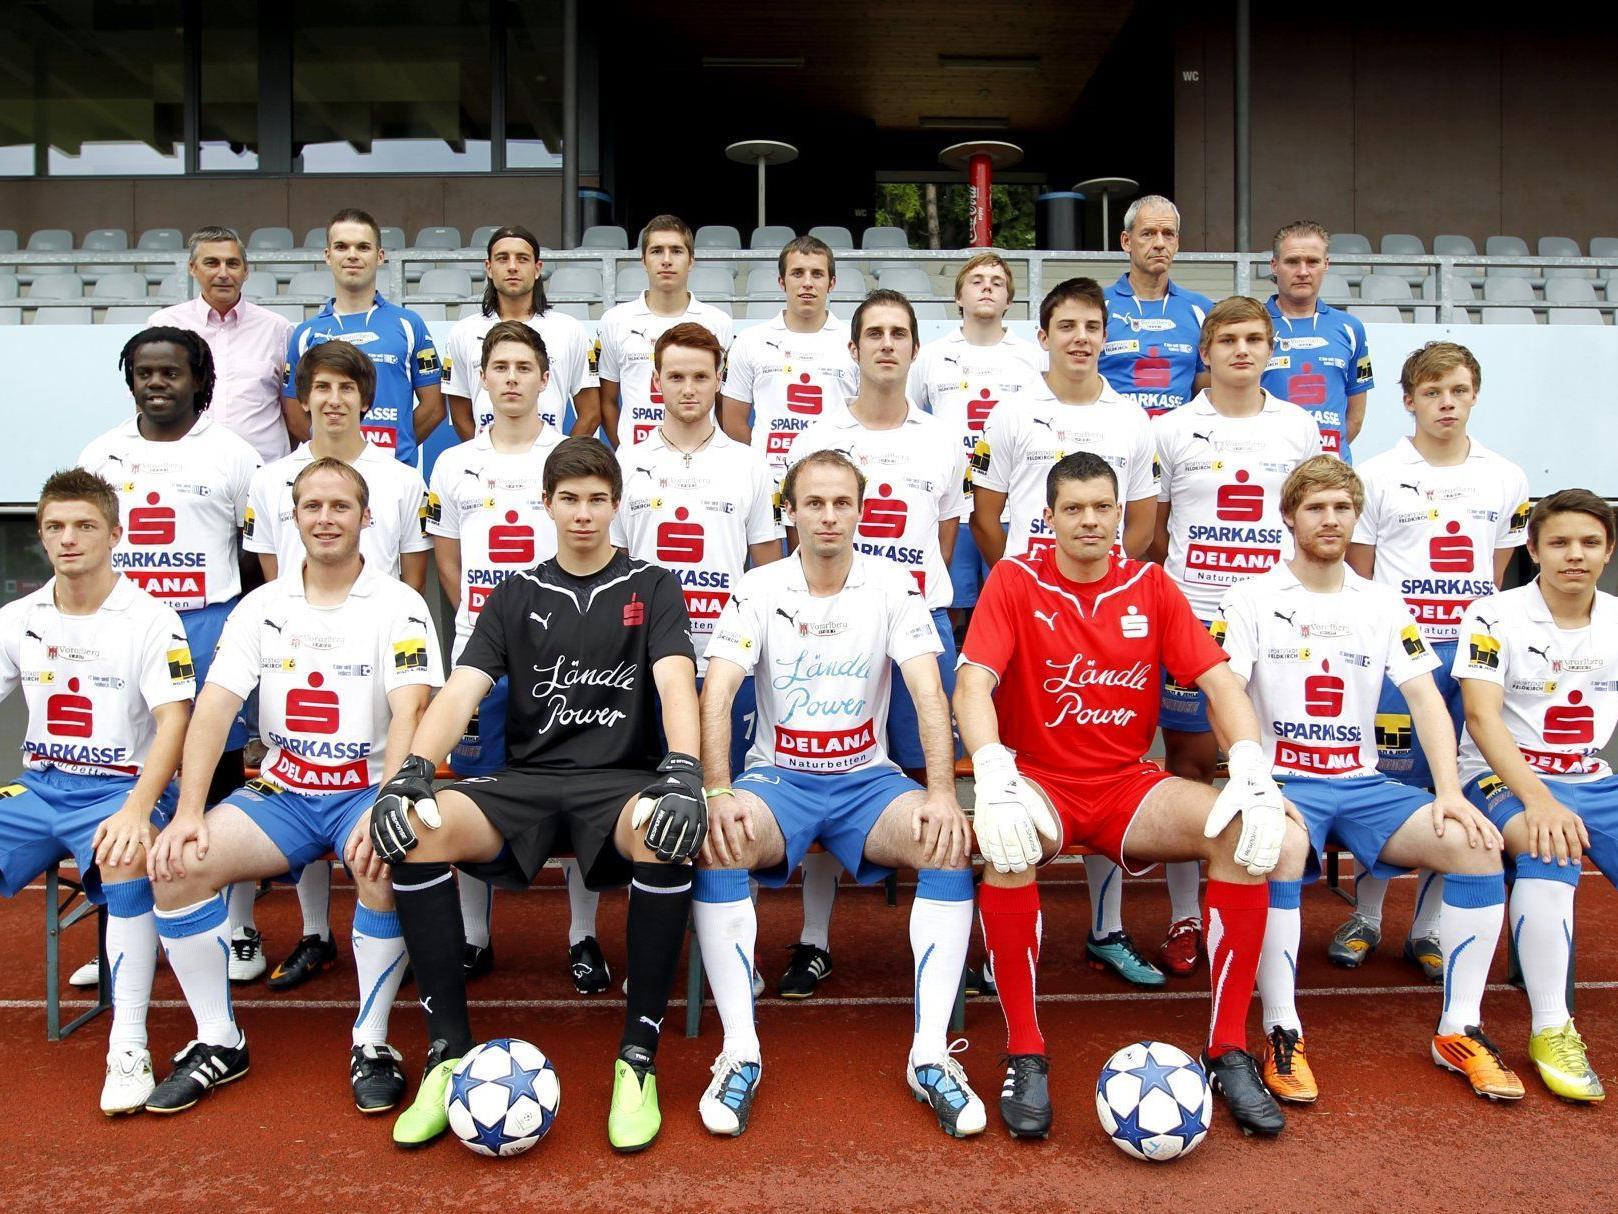 1. Kampfmannschaft Sparkasse Blau Weiß Feldkirch